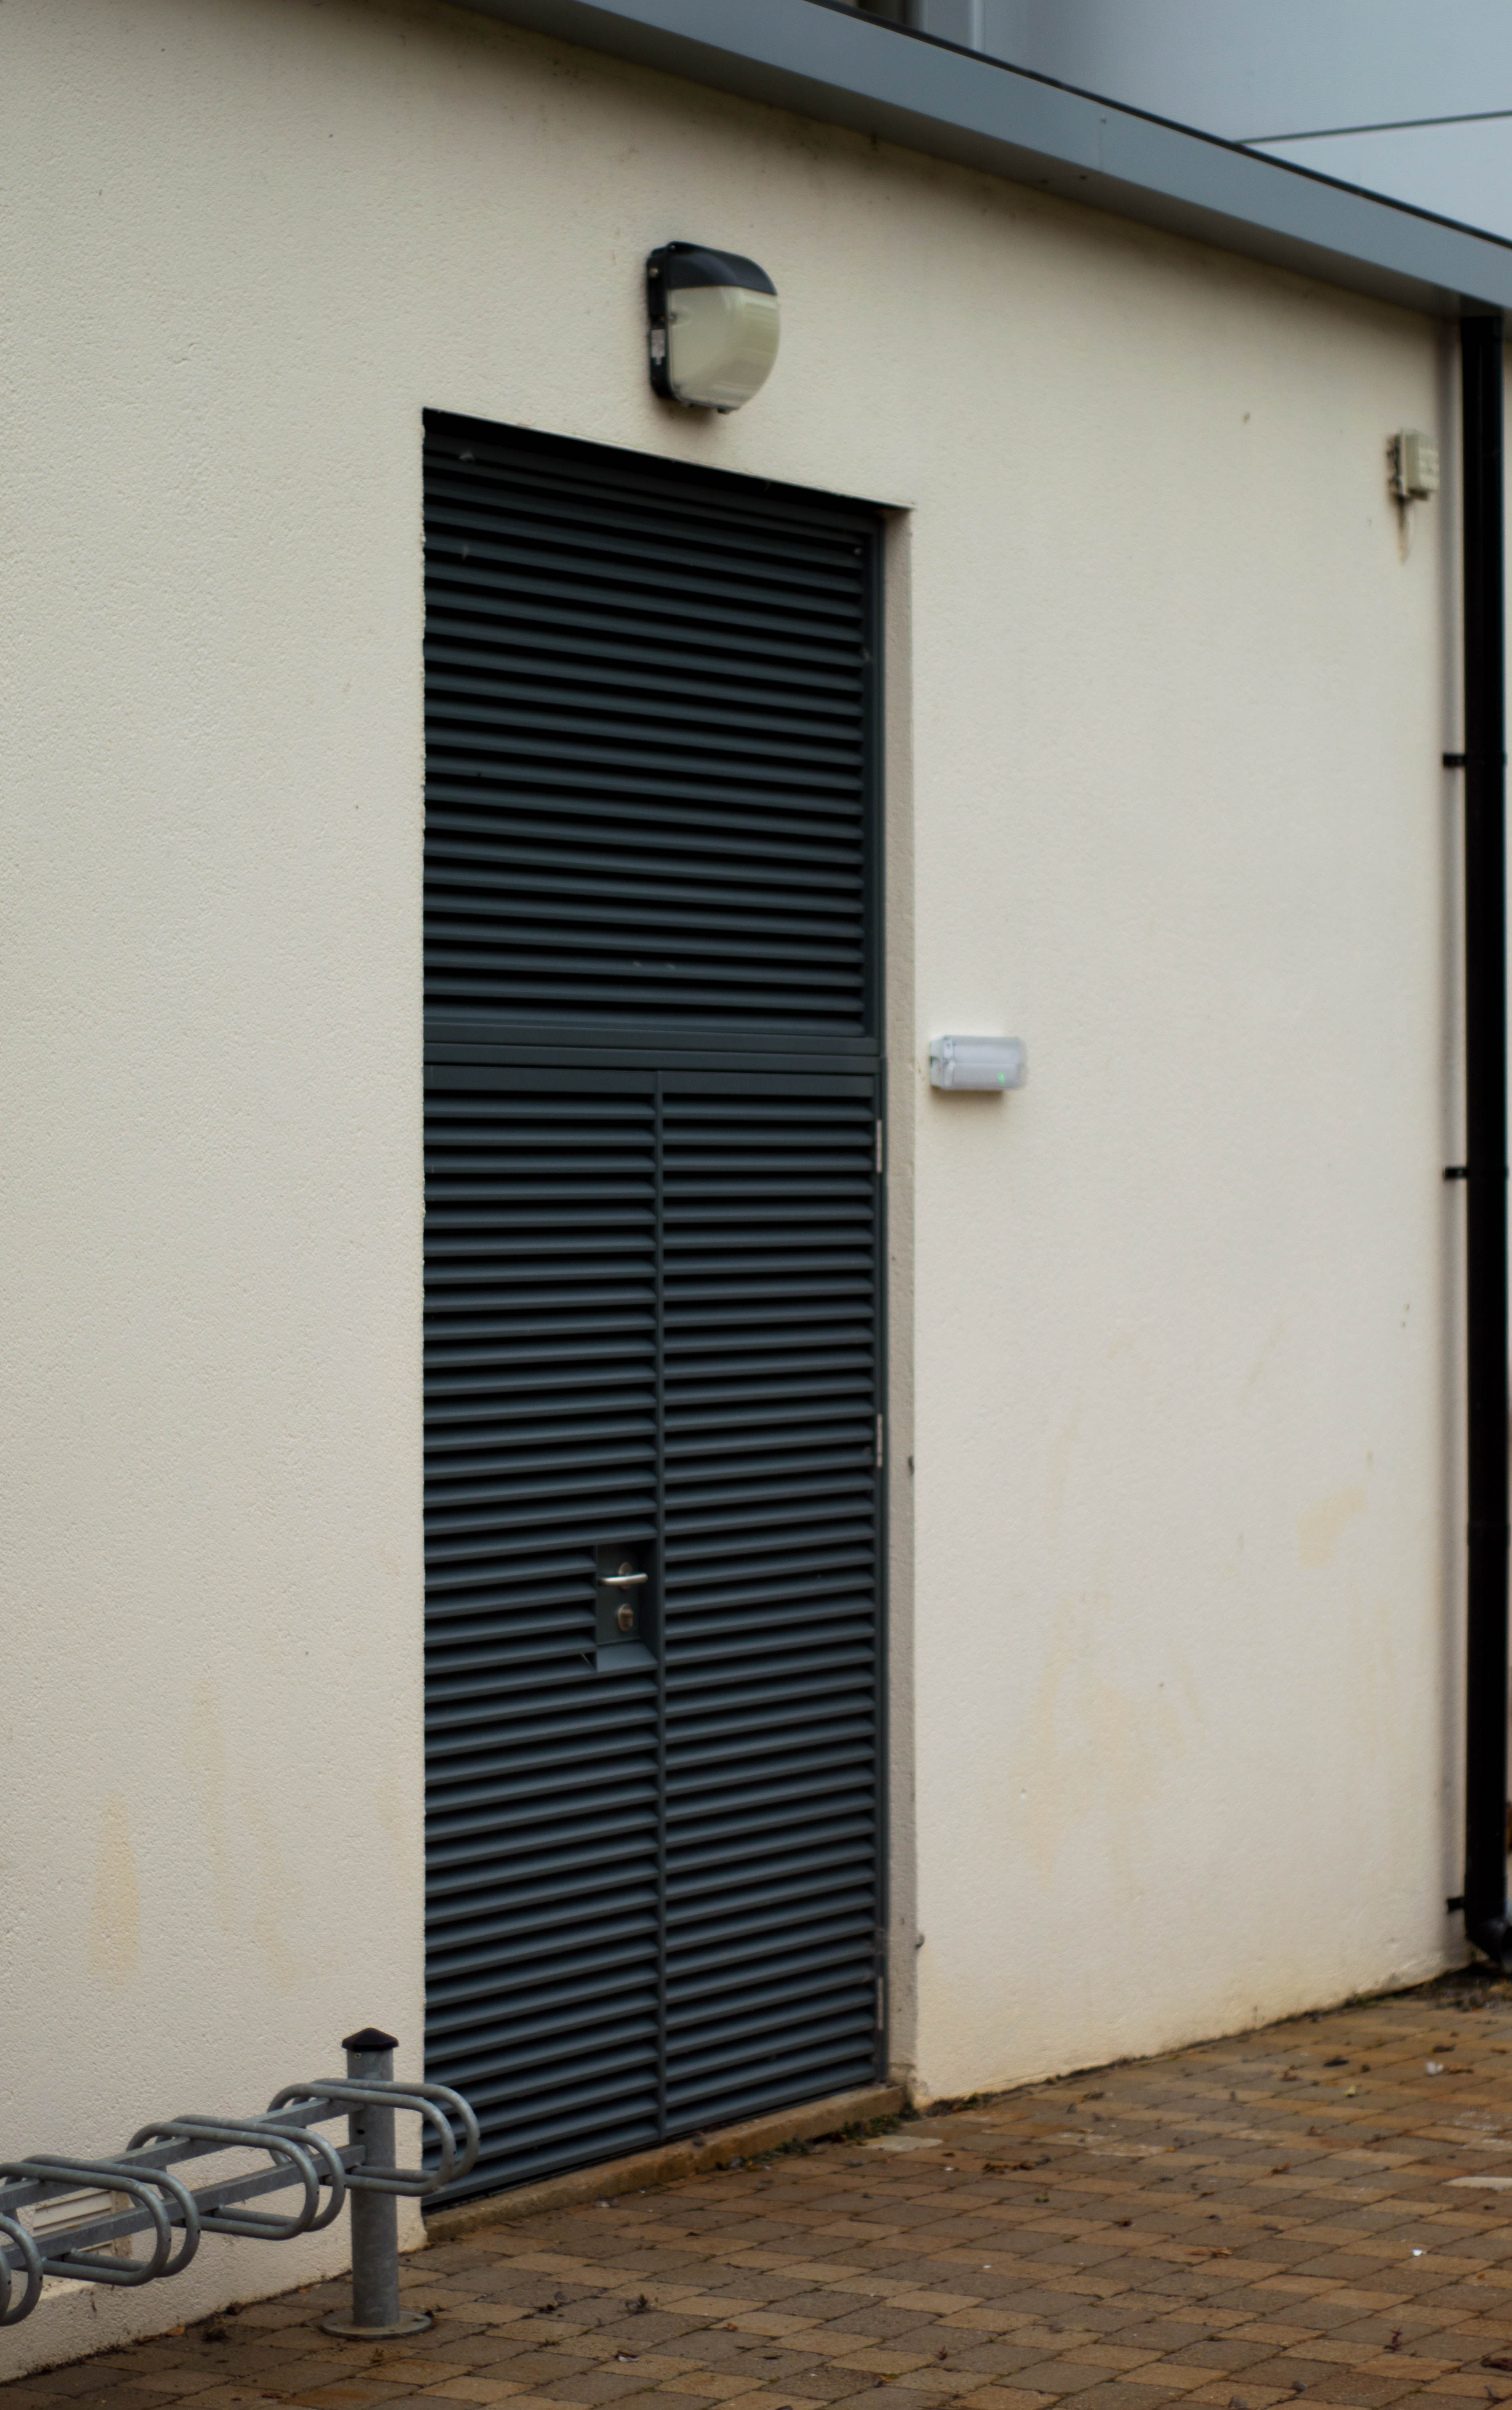 Steel Doors - NWRC Limavady Campus - LRD08